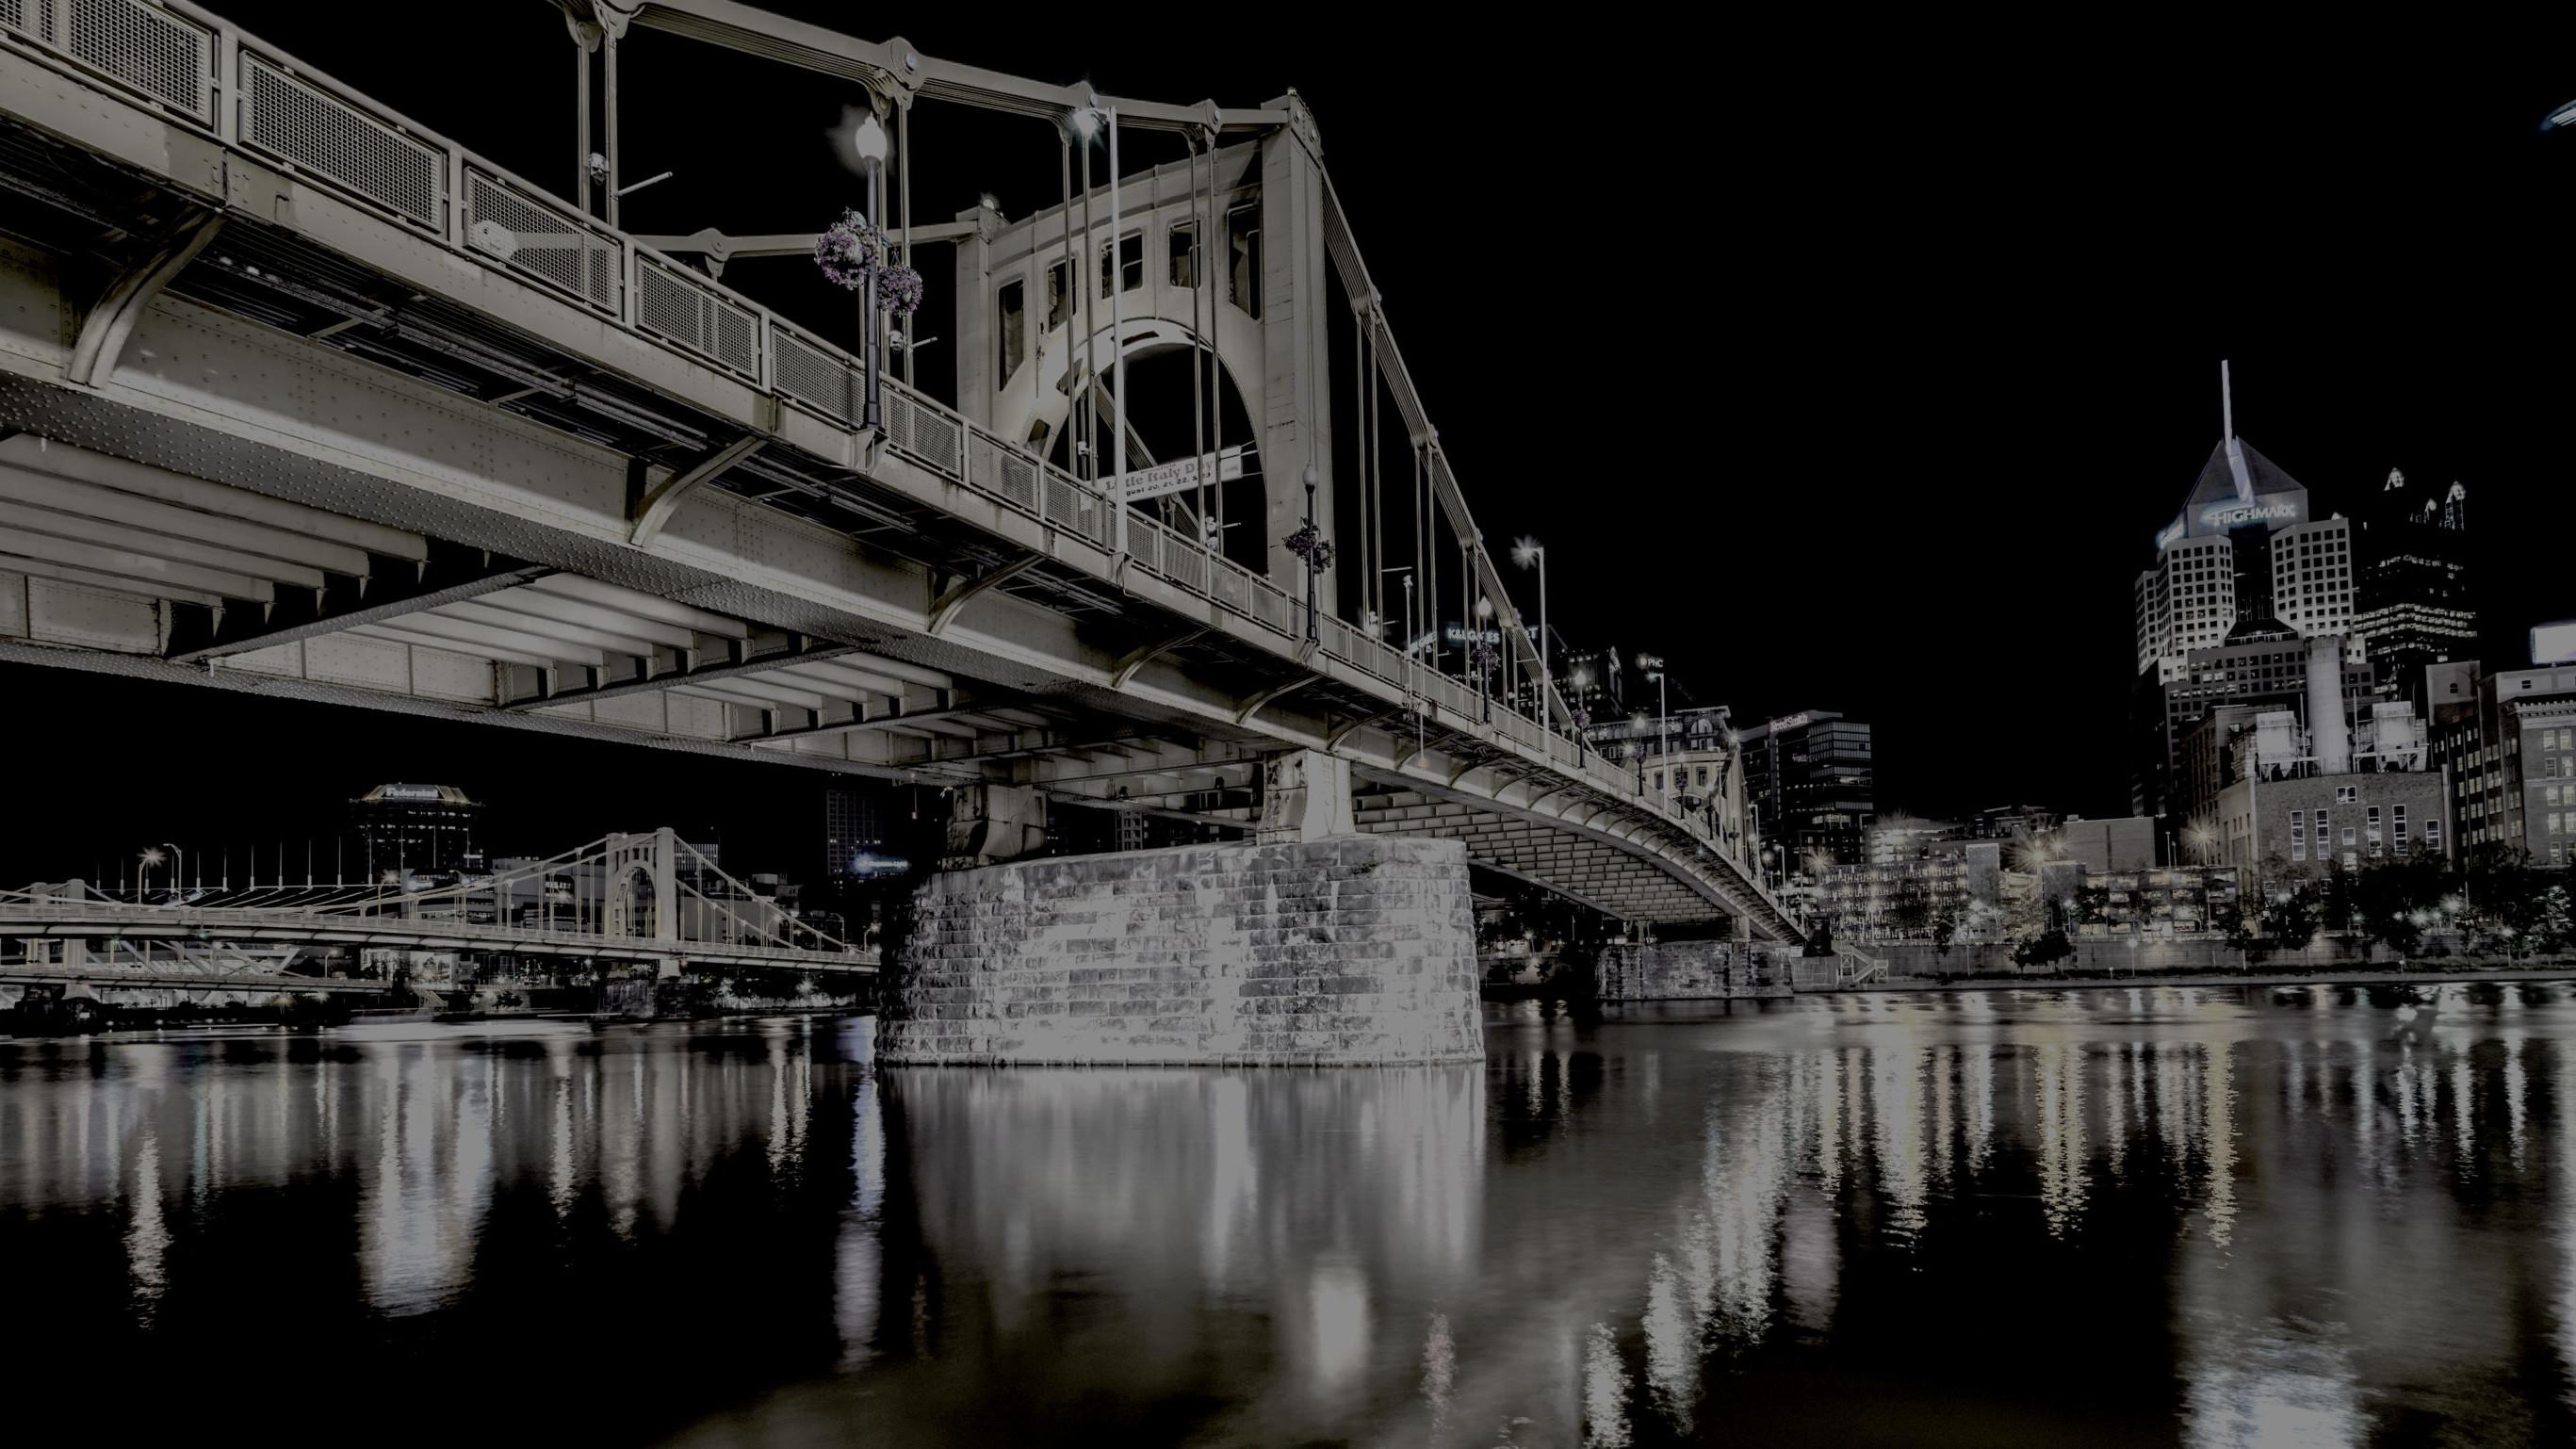 Roberto Clemente Bridge in Pittsburgh, PA